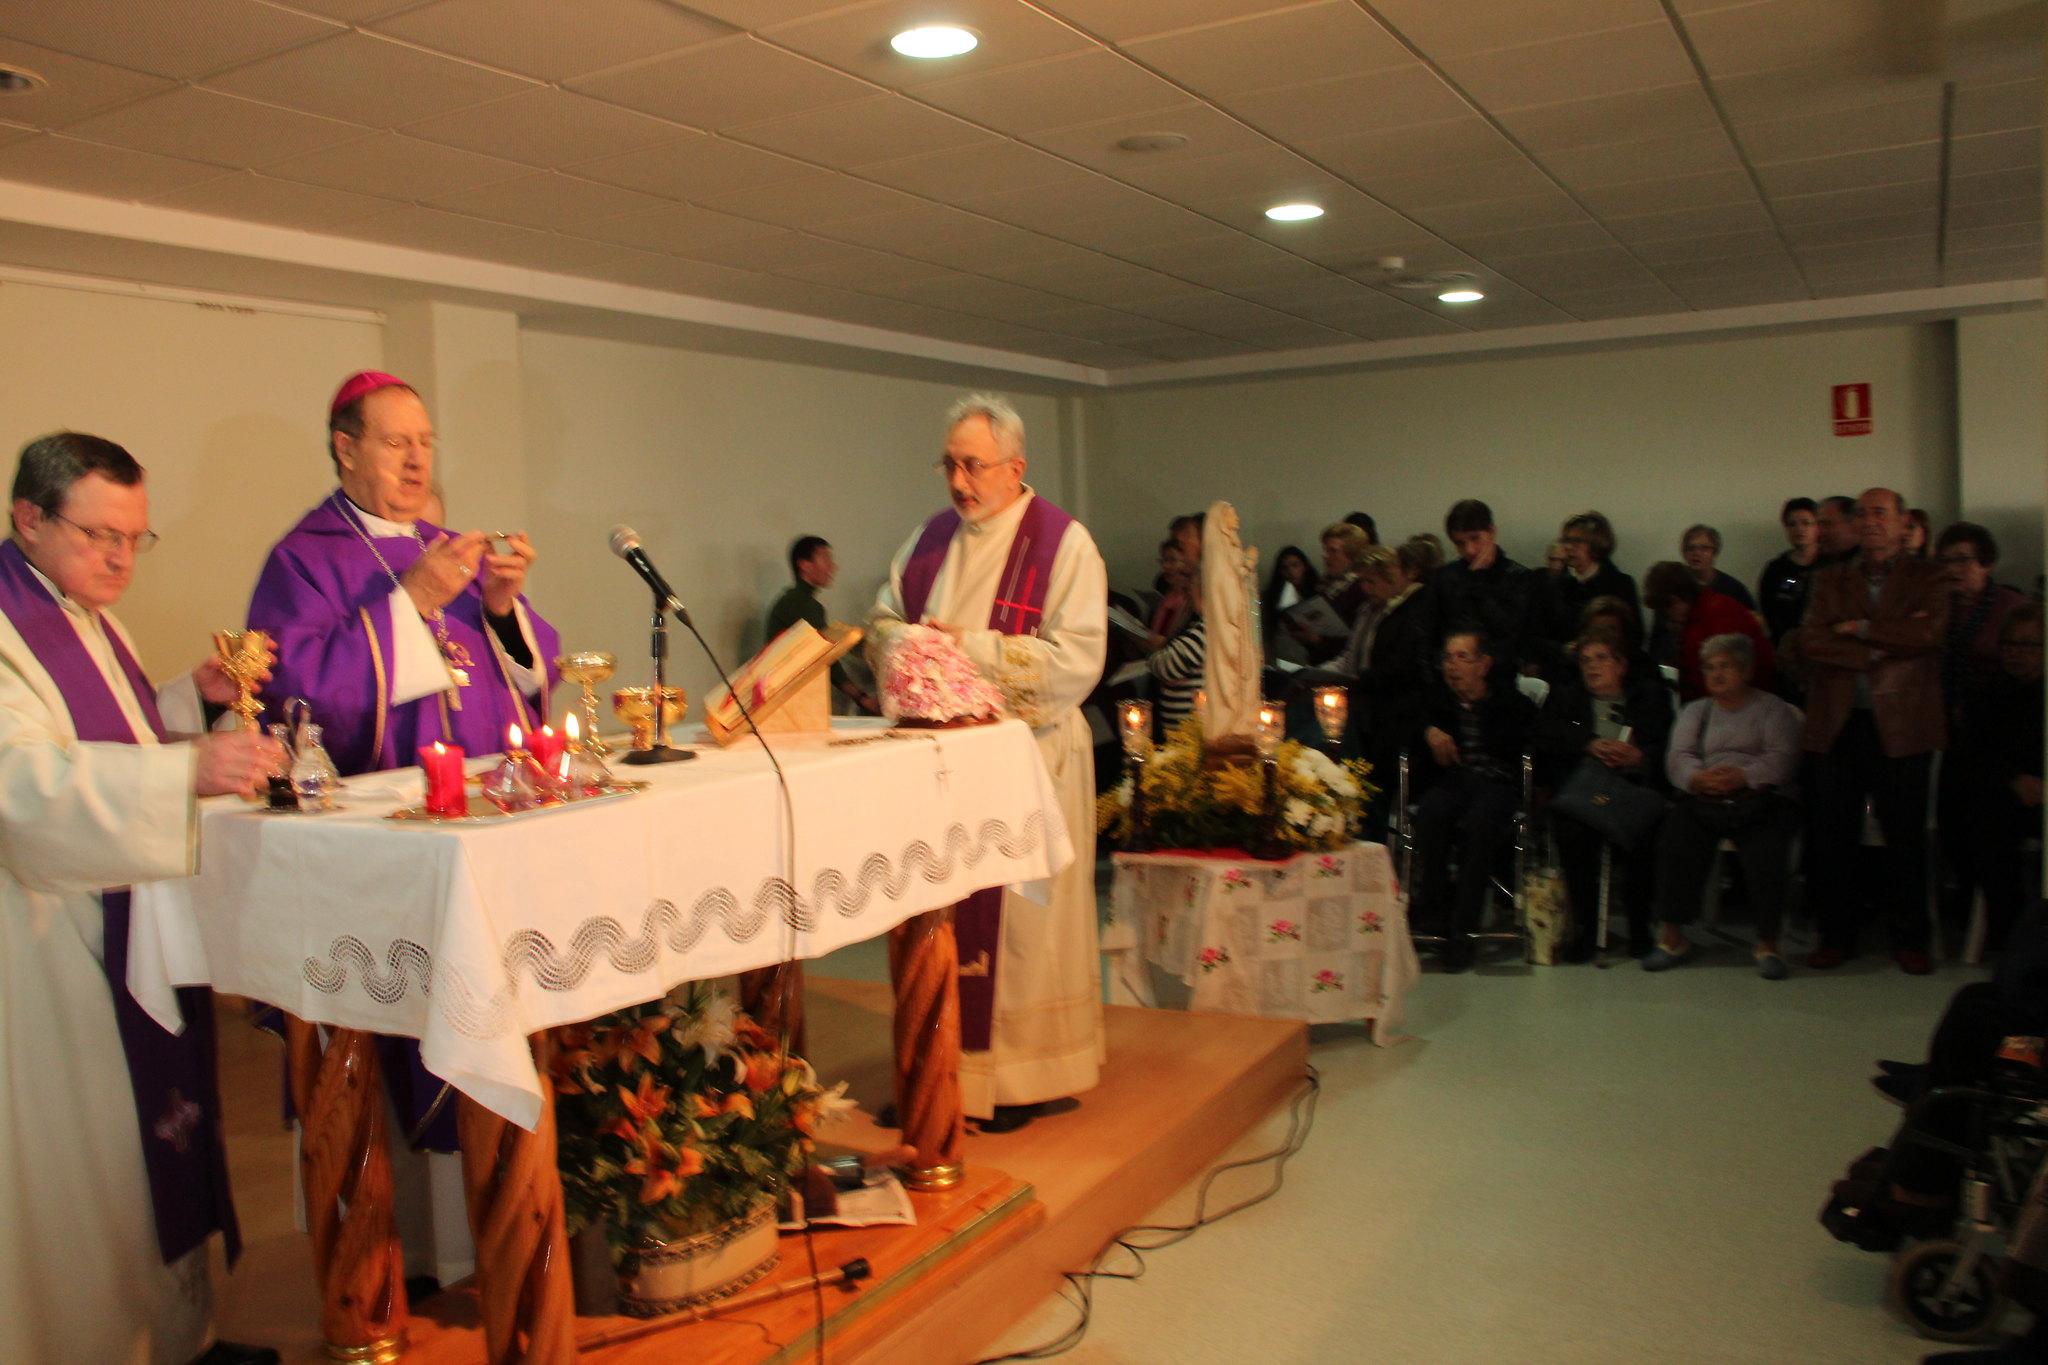 (2016-02-13) - Inauguración Virgen De Lourdes, La Molineta - Archivo La Molineta (041)